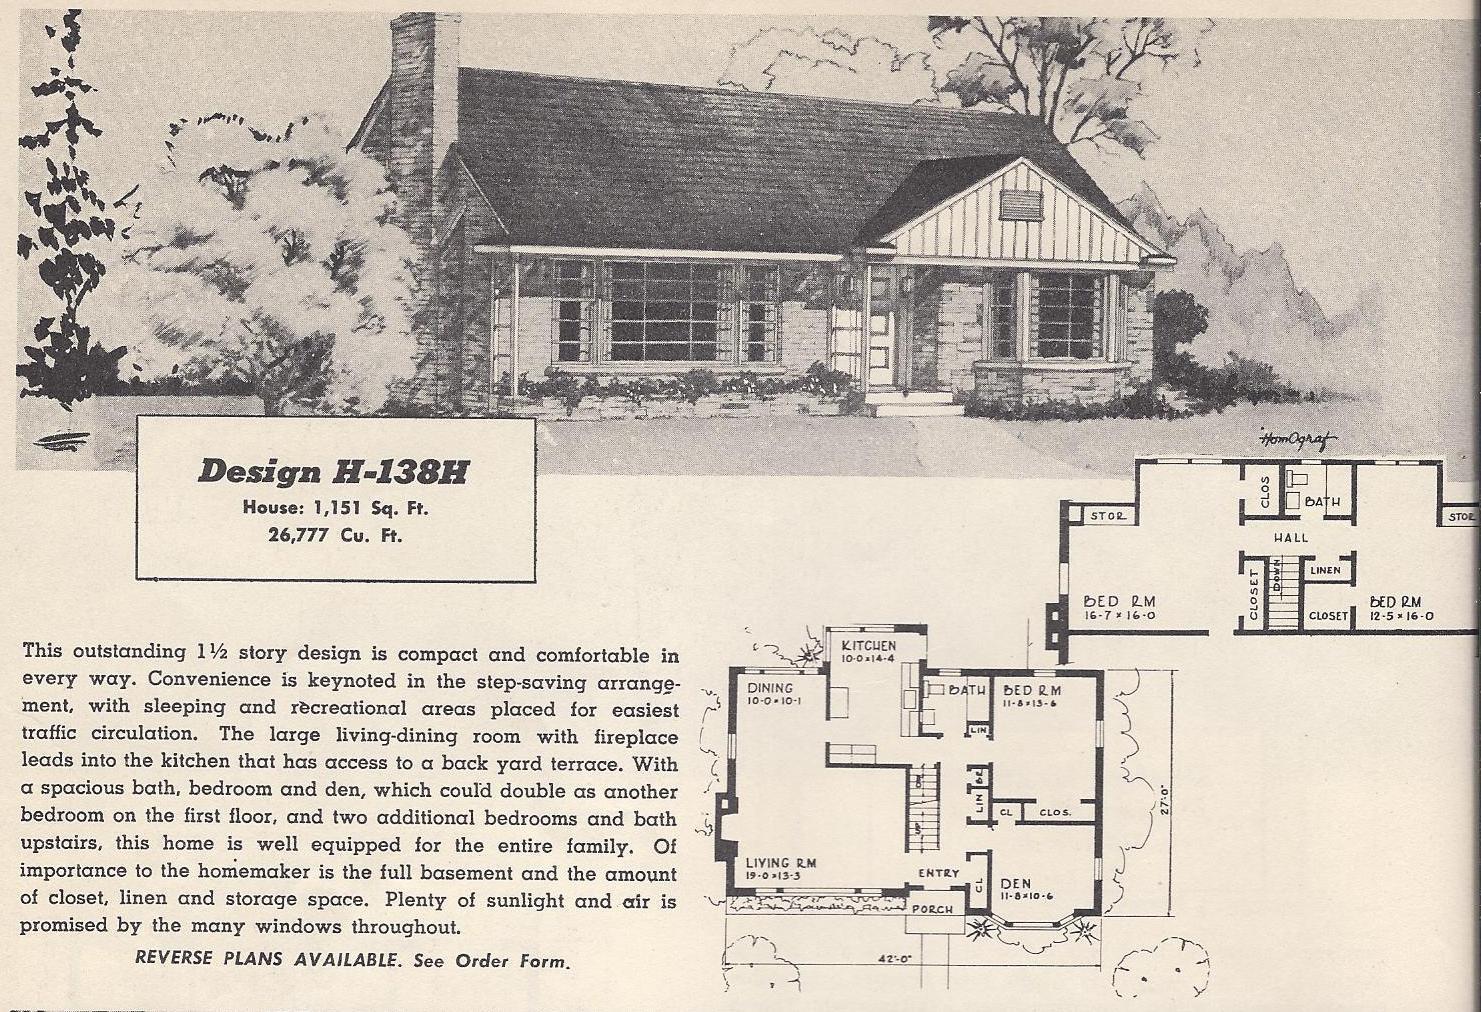 Vintage house plans 138h antique alter ego for Vintage ranch house plans